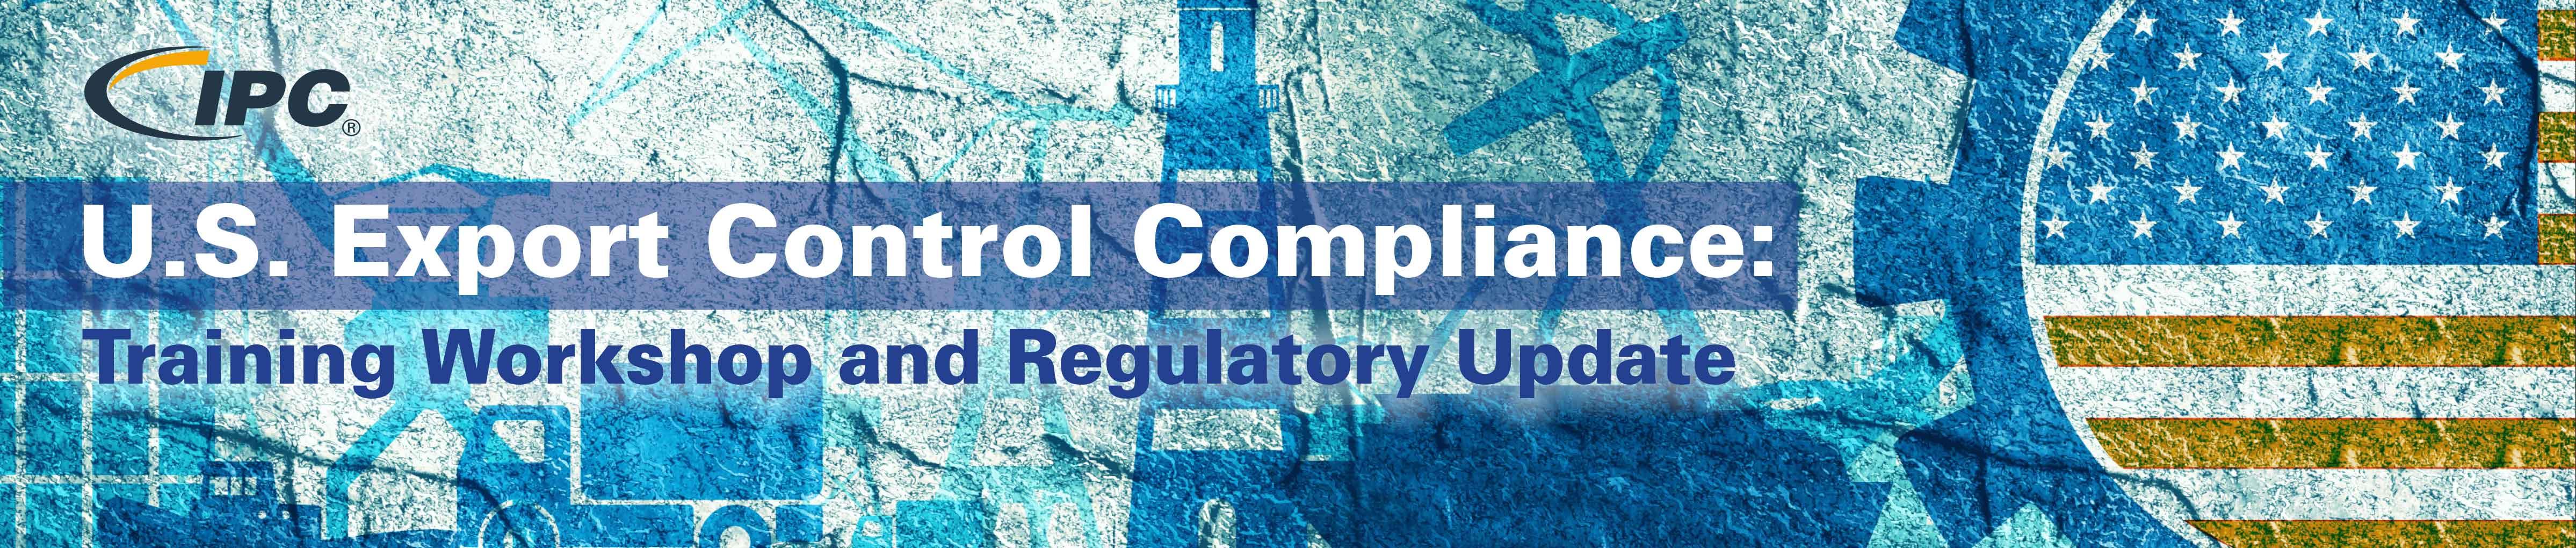 U.S. Export Control Compliance: Training Workshop and Regulatory Update